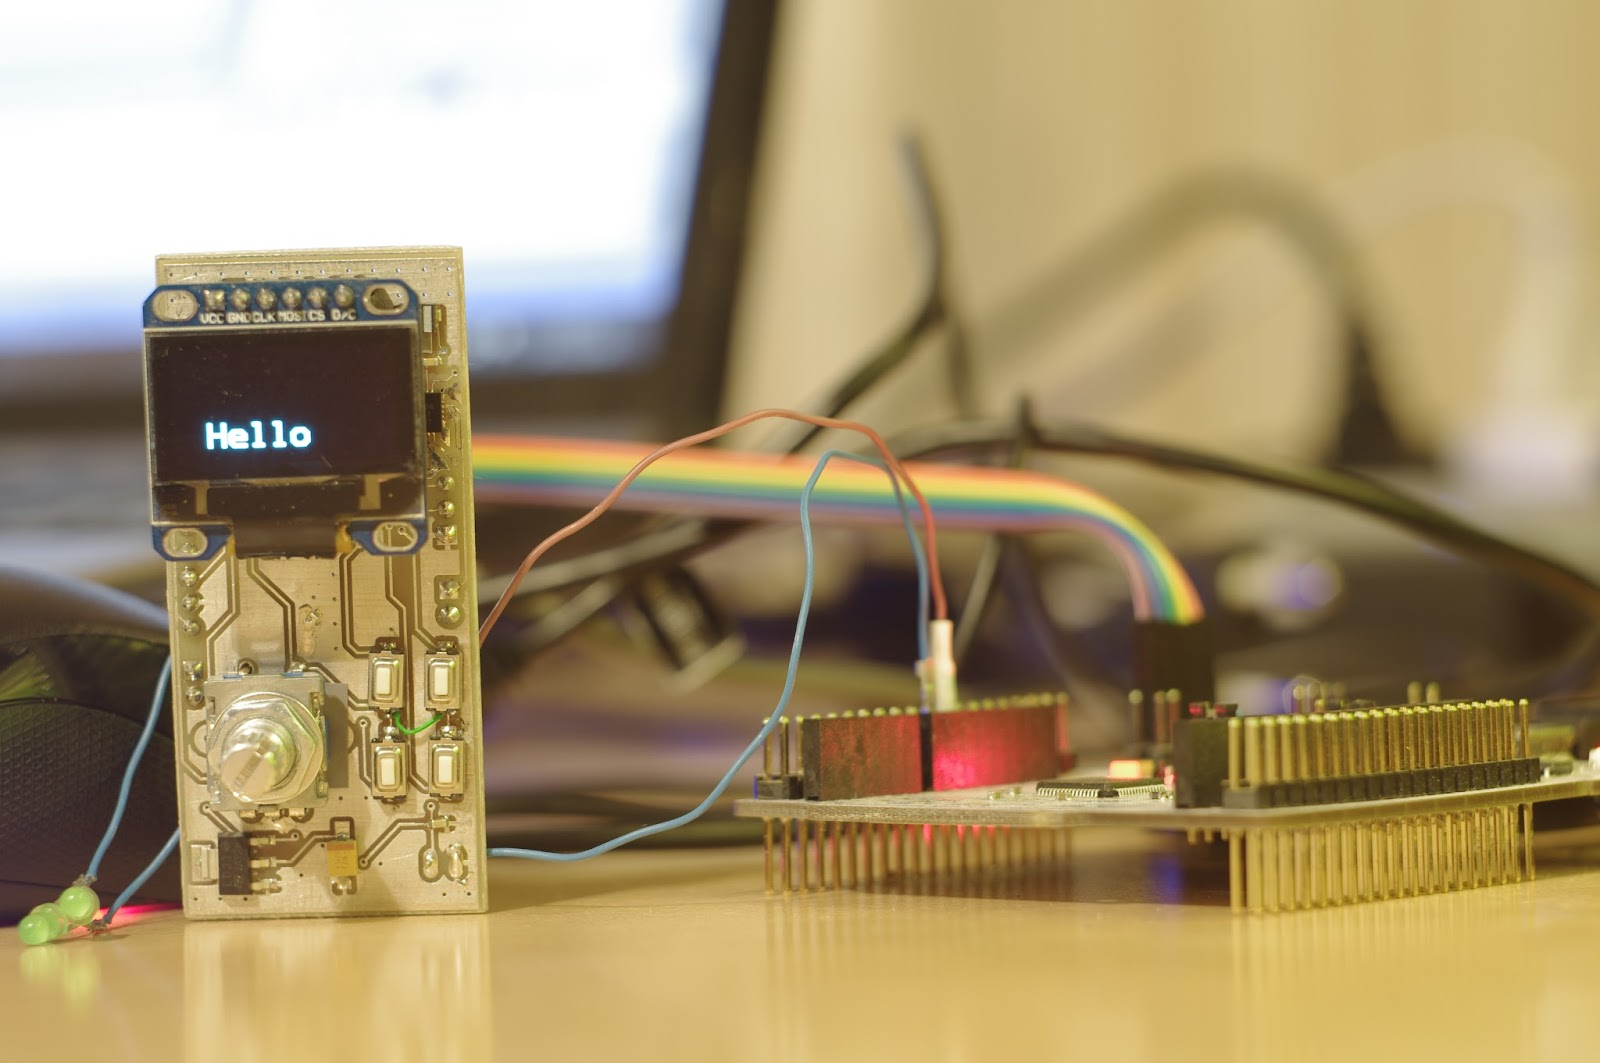 STM32 + SPI OLED SSD1306 + u8glib + CubeMX